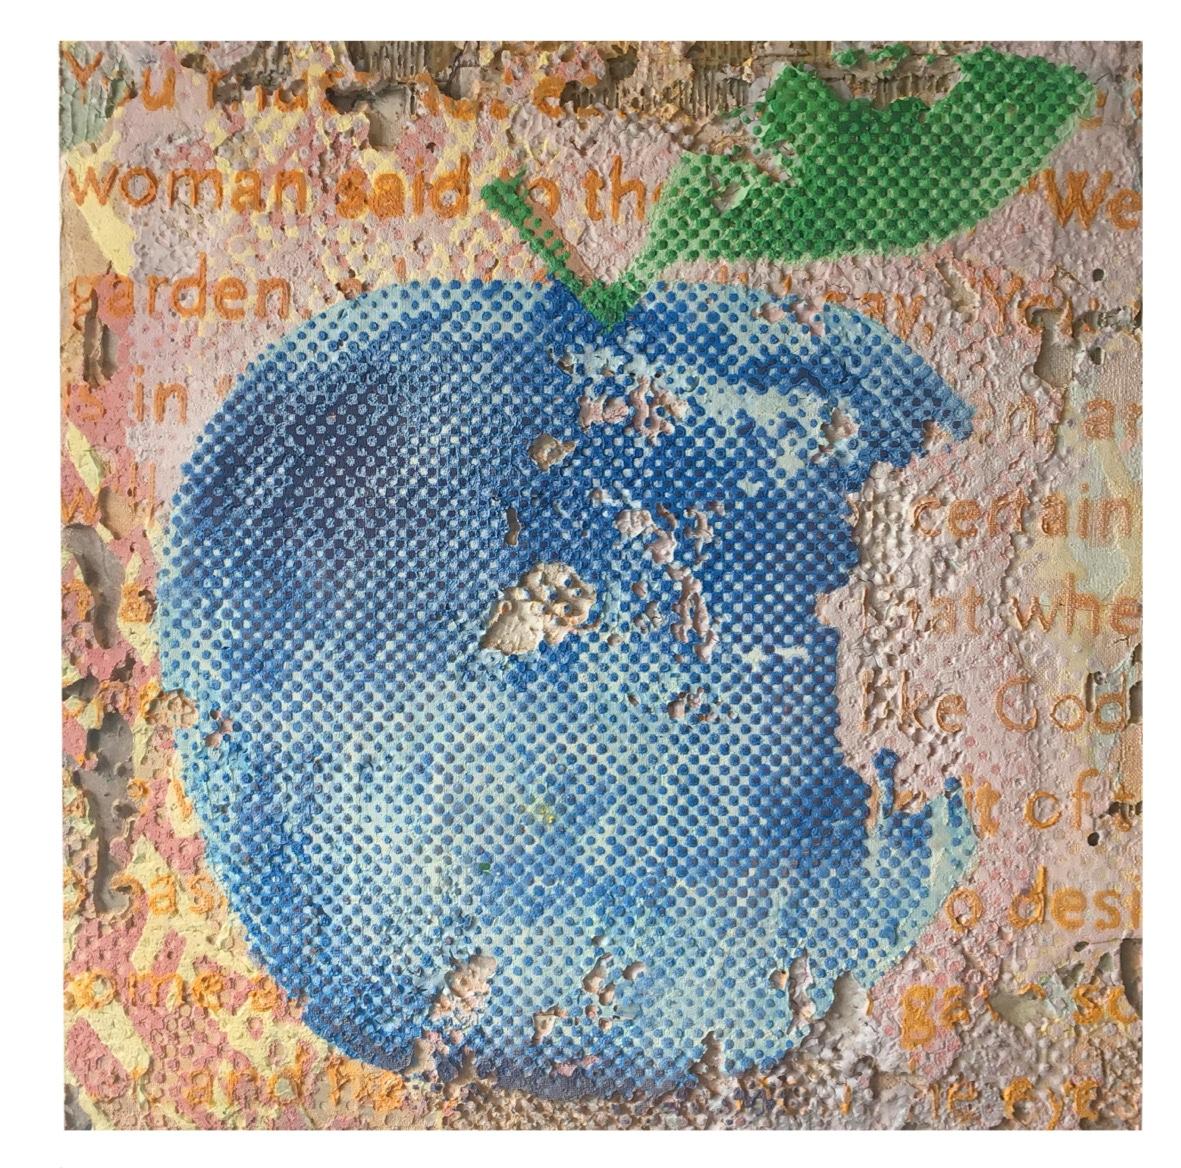 The blue forbidden fruit – apple   2019, 50x50cm